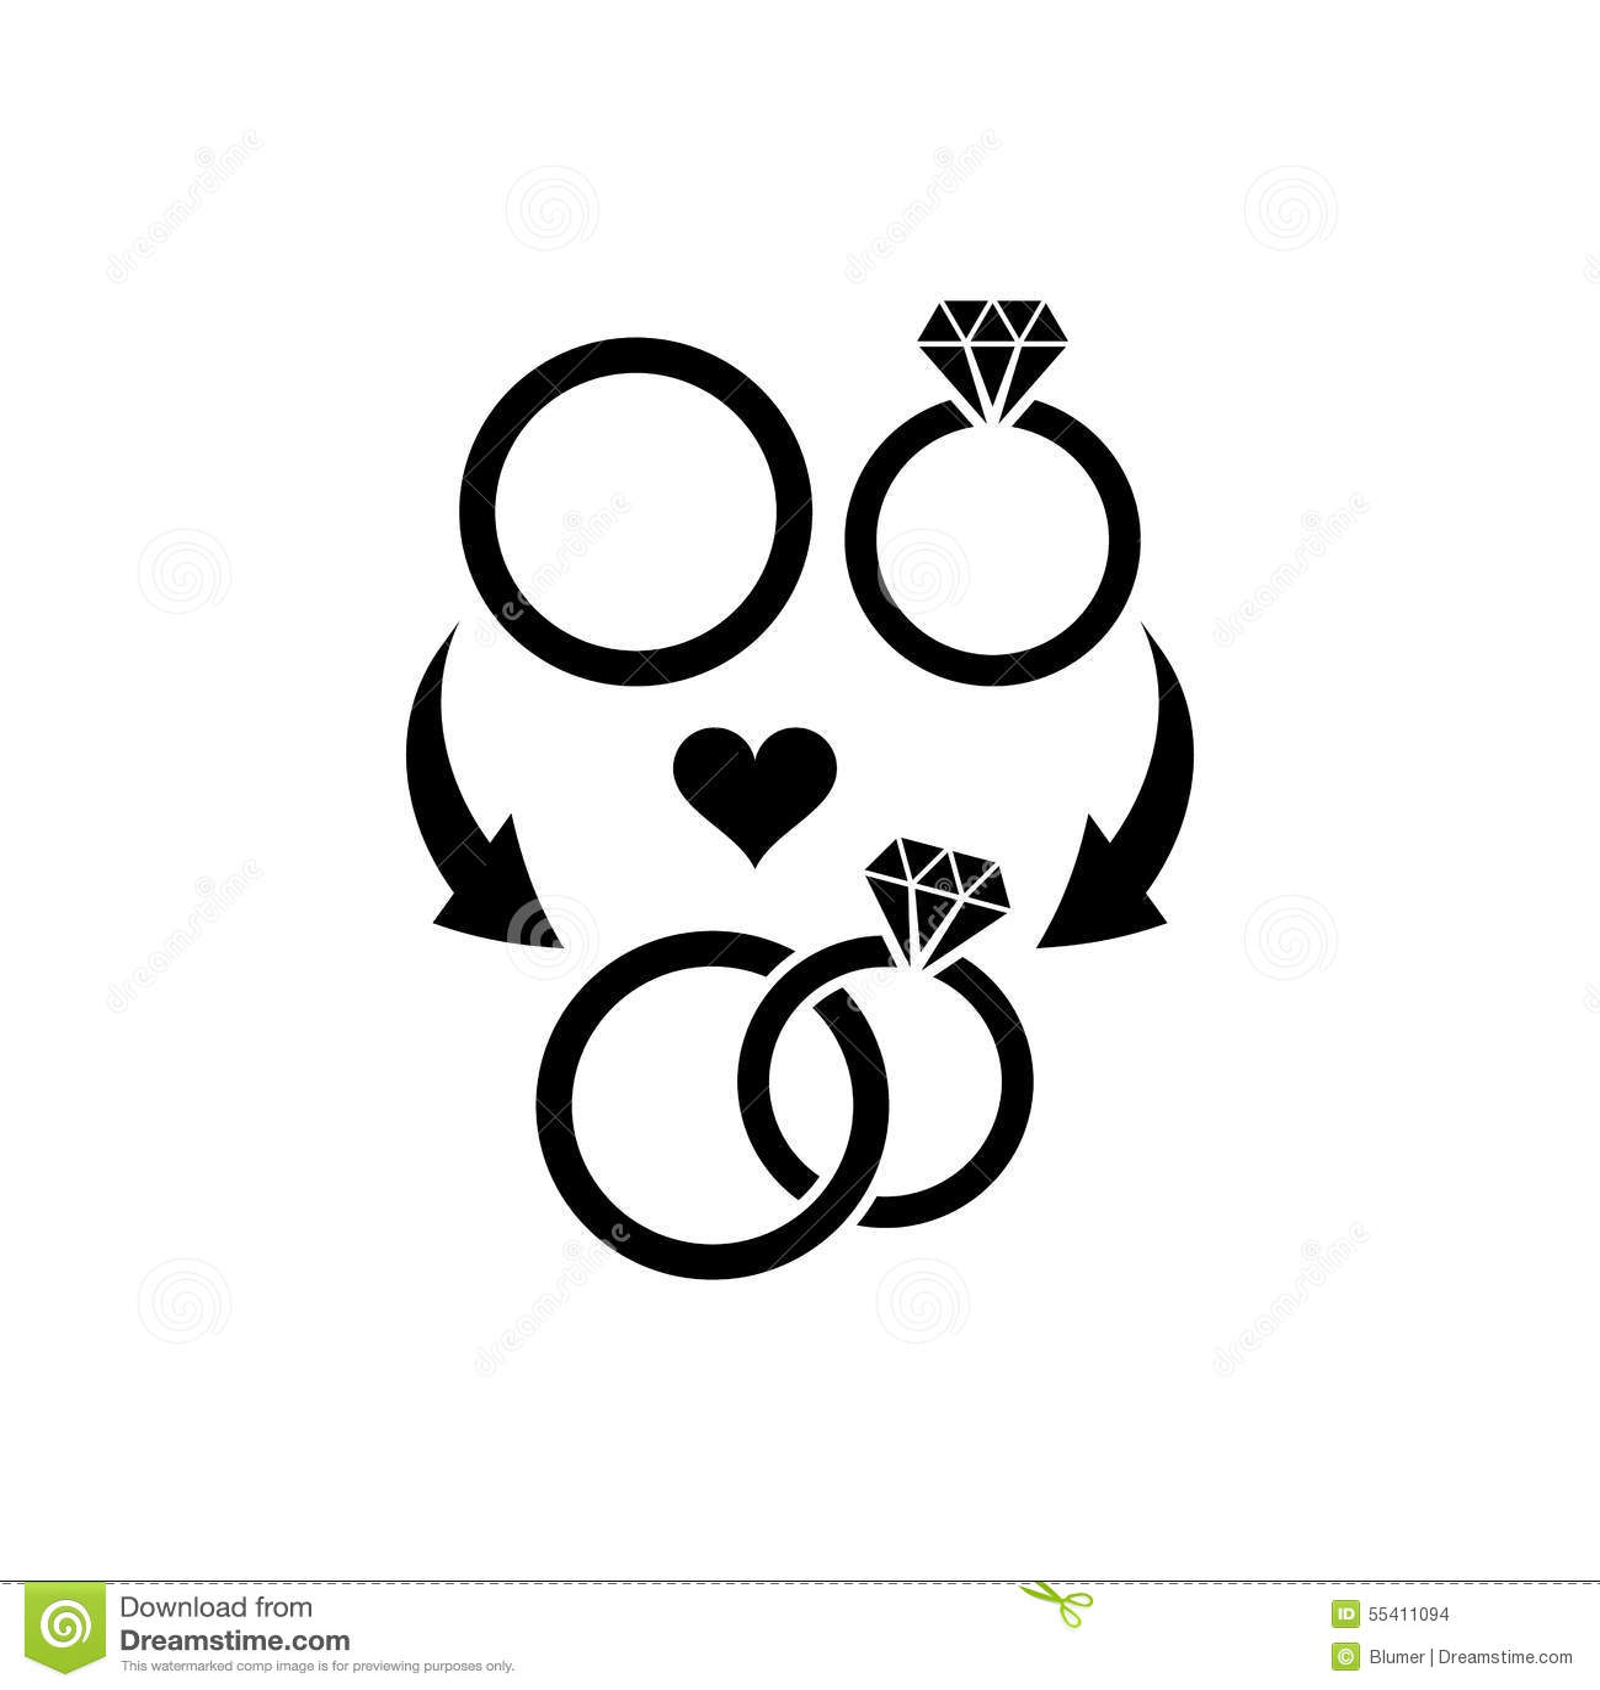 Wedding rings symbol  Wedding Rings Symbol Stock Vector - Image: 55411094